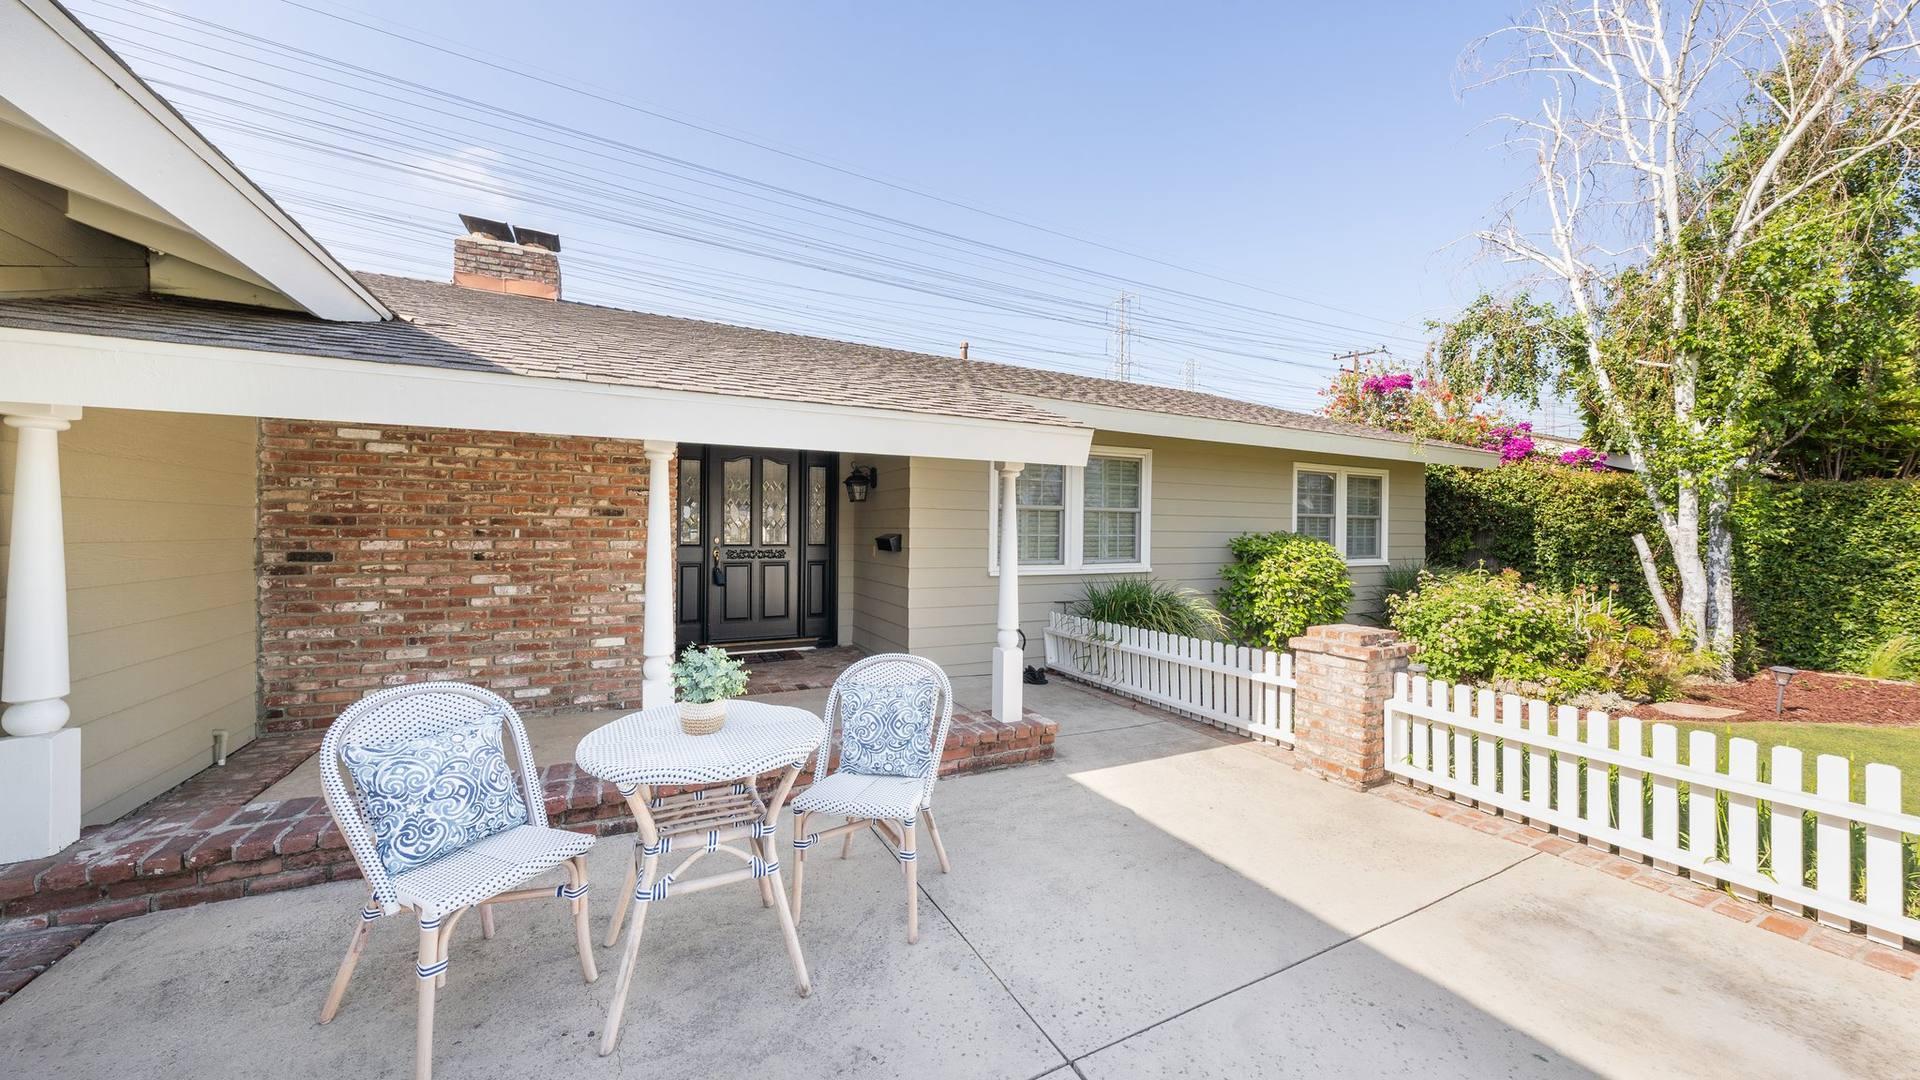 1126 E Chestnut Ave, Orange, CA 92867, US